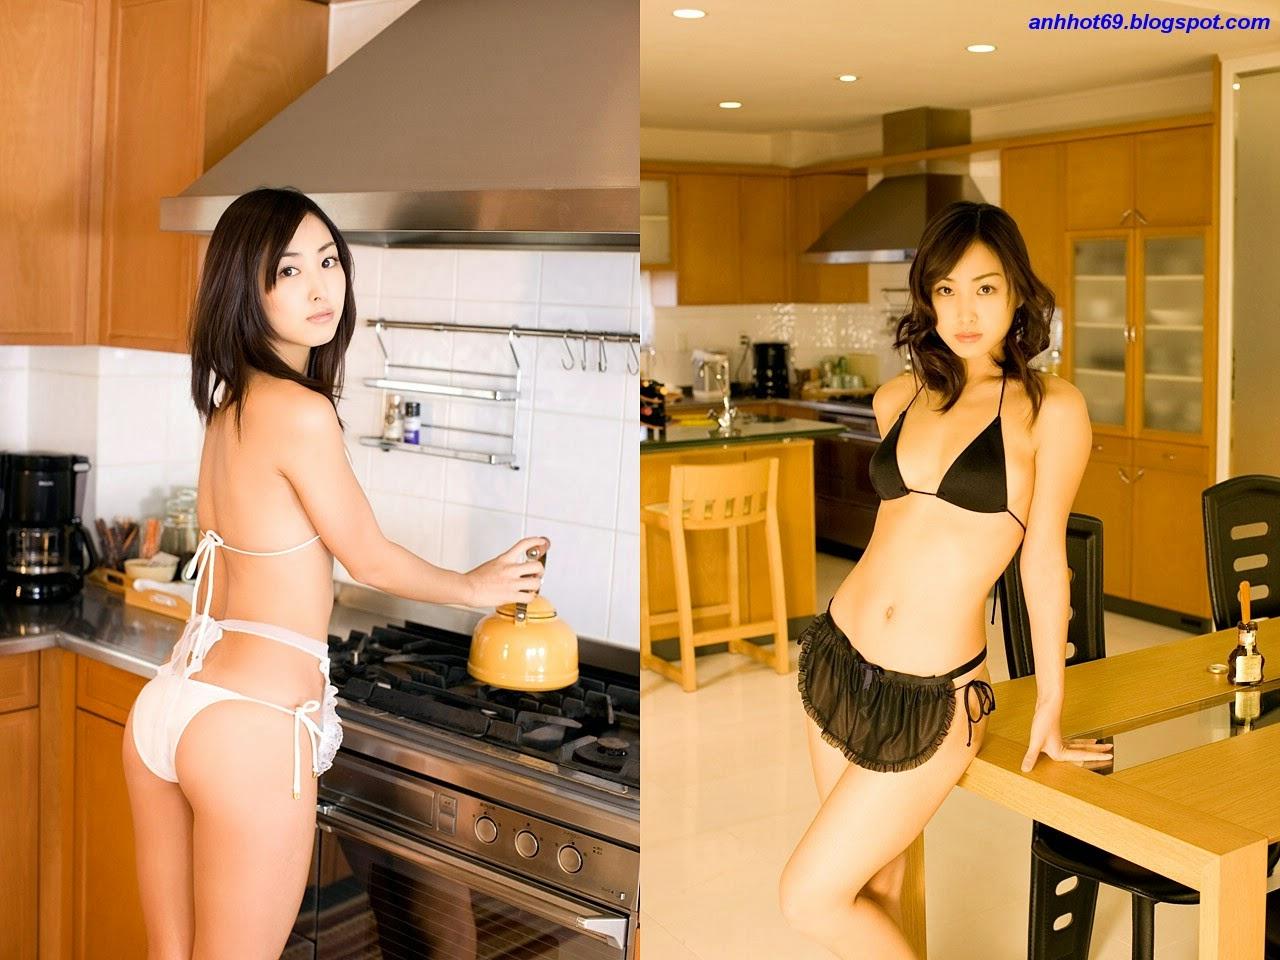 minase-yashiro-00438642